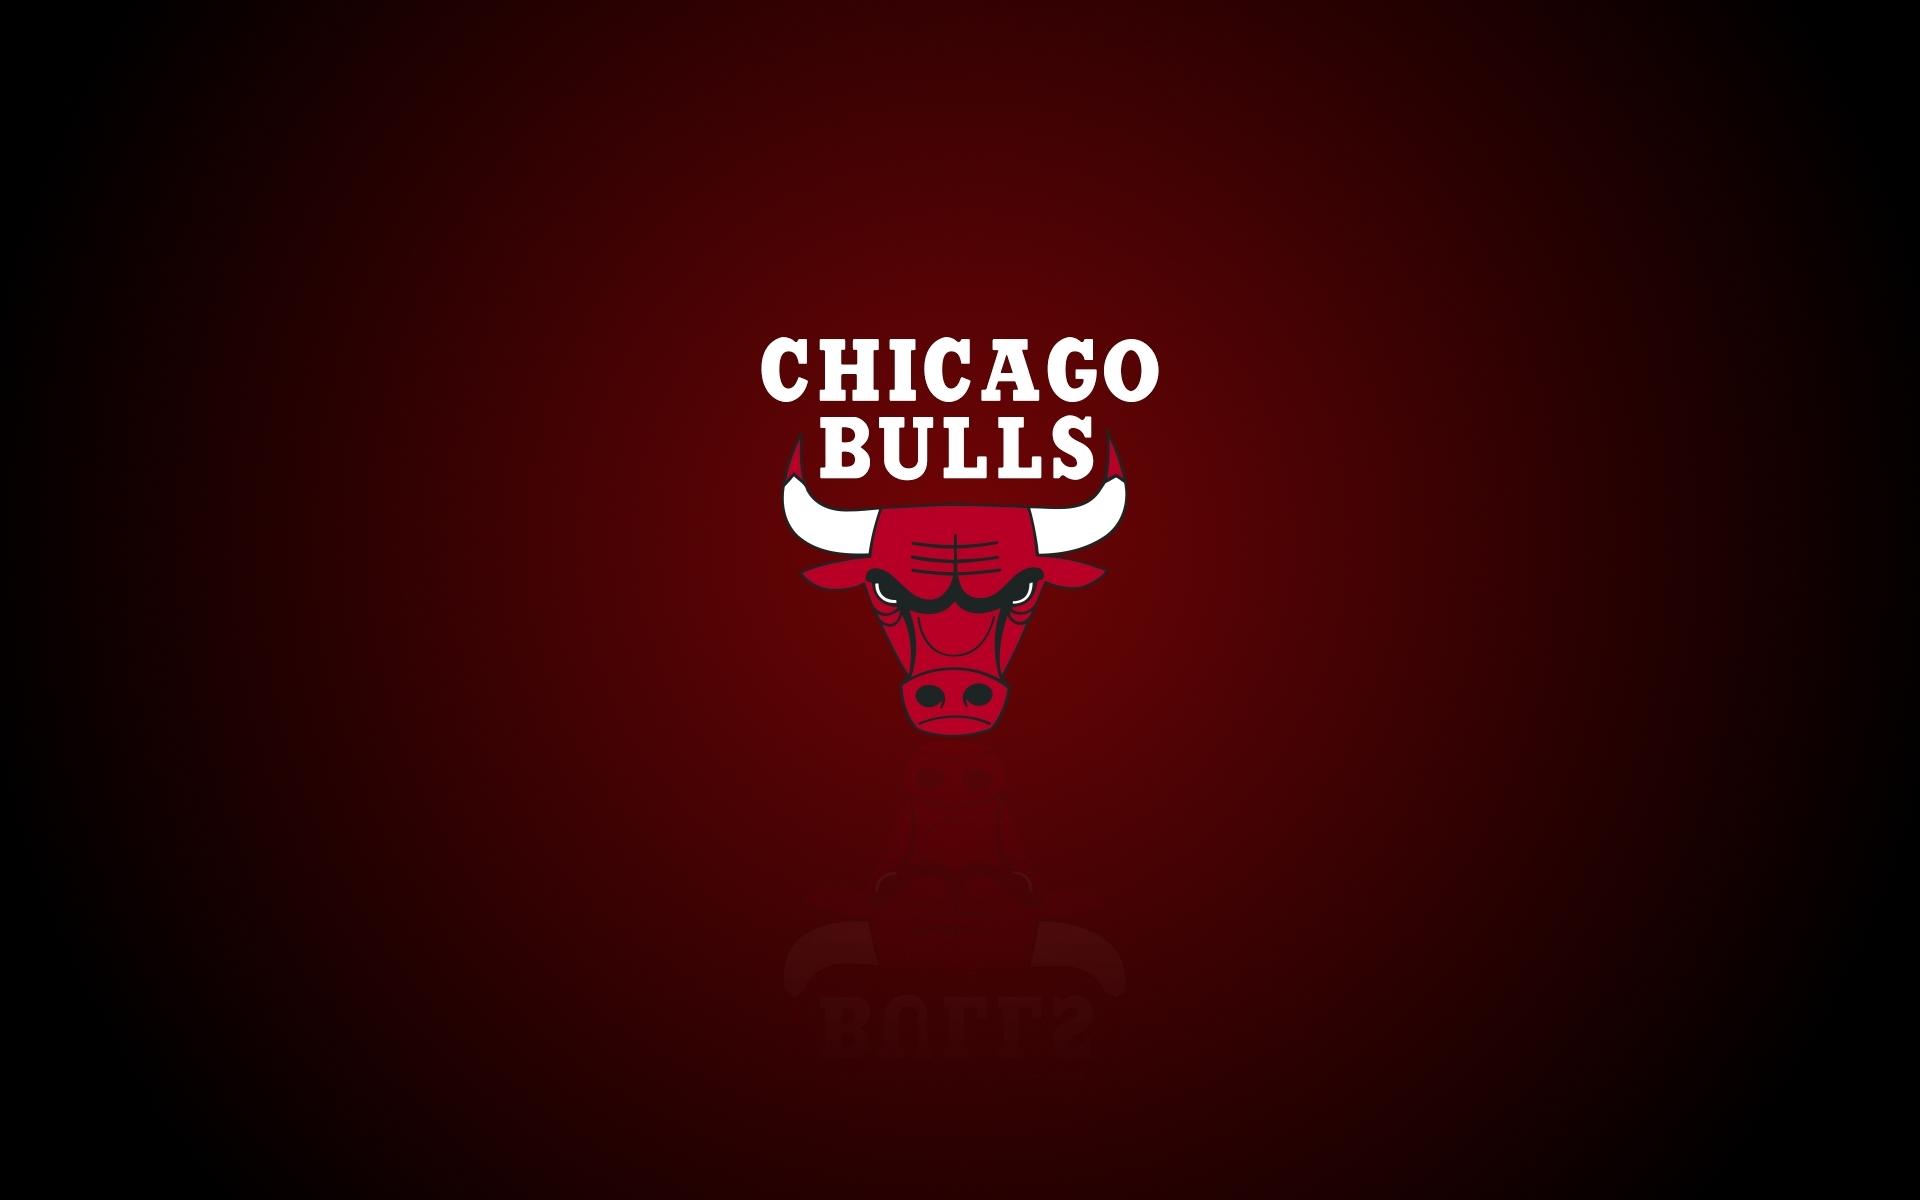 Cleveland Cavaliers Logo >> Chicago Bulls – Logos Download